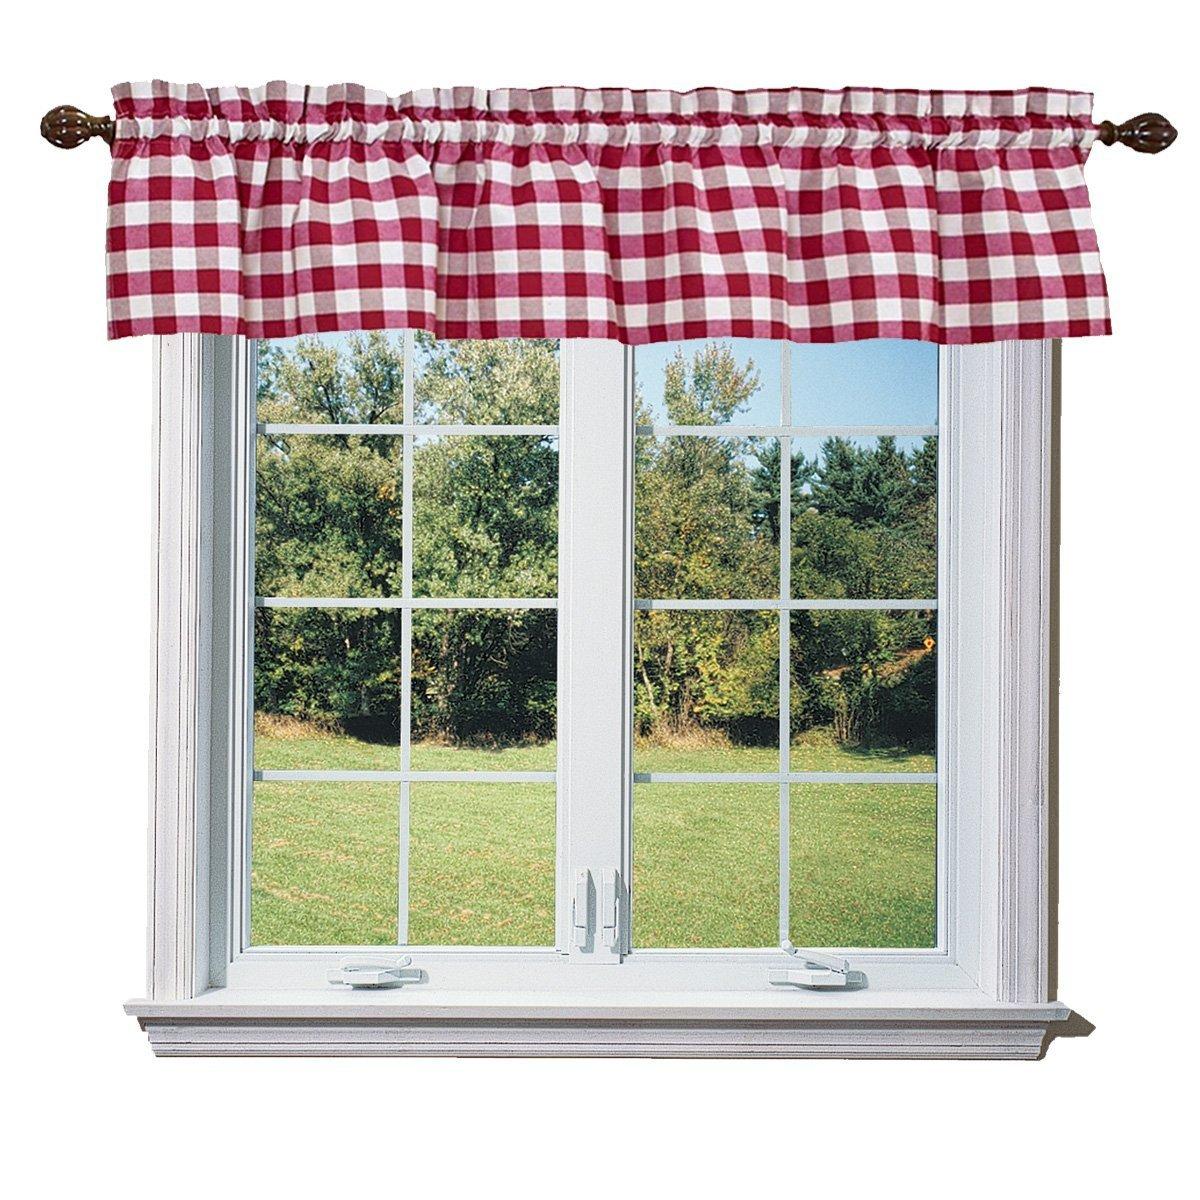 lovemyfabric Poly Cotton Gingham Checkered Plaid Design Kitchen Curtain Valance Window Treatment-Red